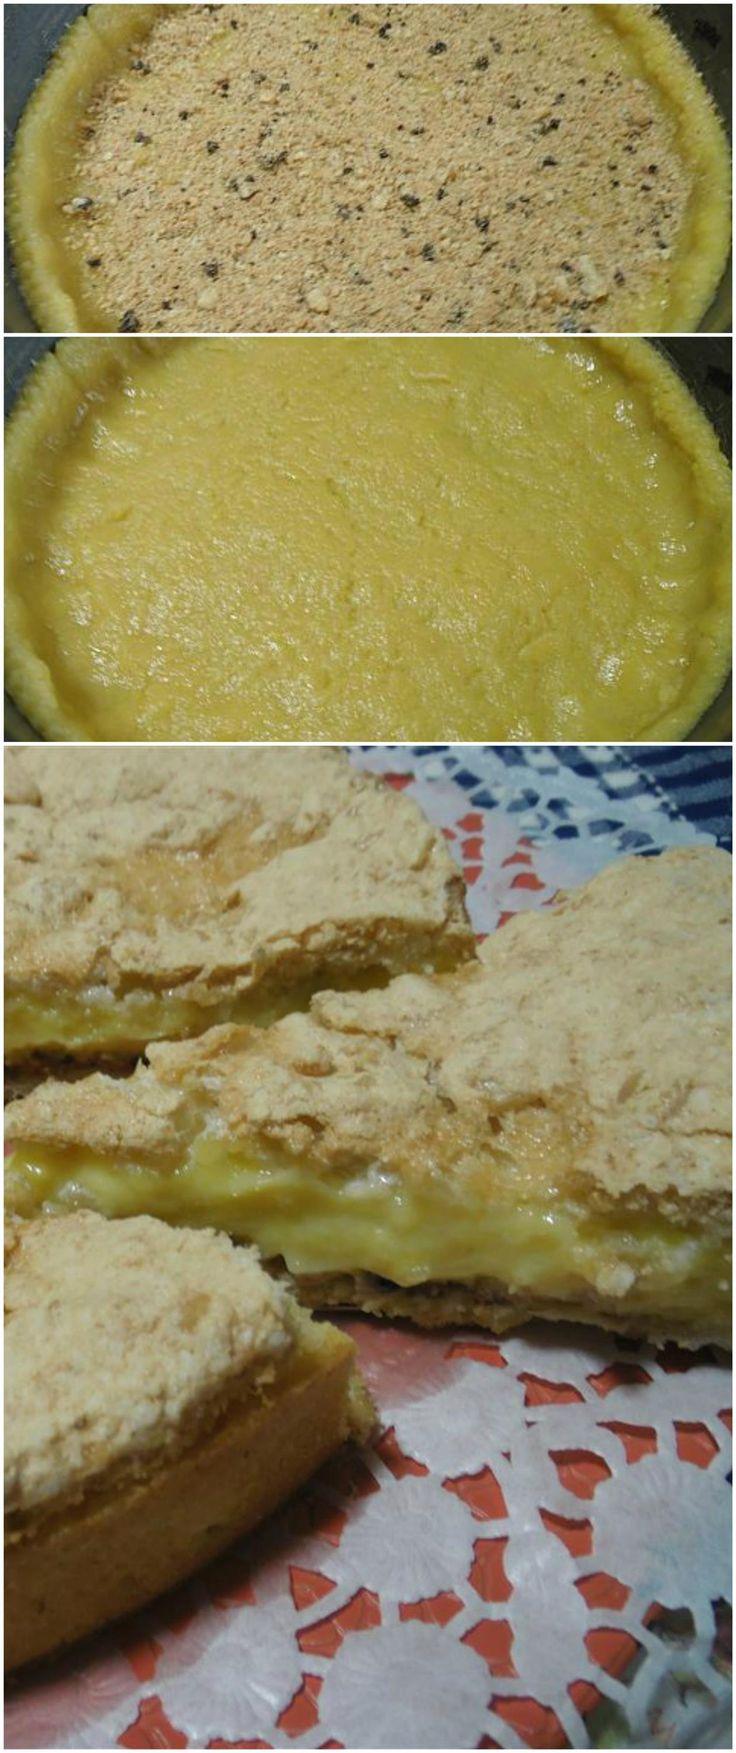 Crostata alla crema meringata, super golosa !! #crostata #ricettegustose